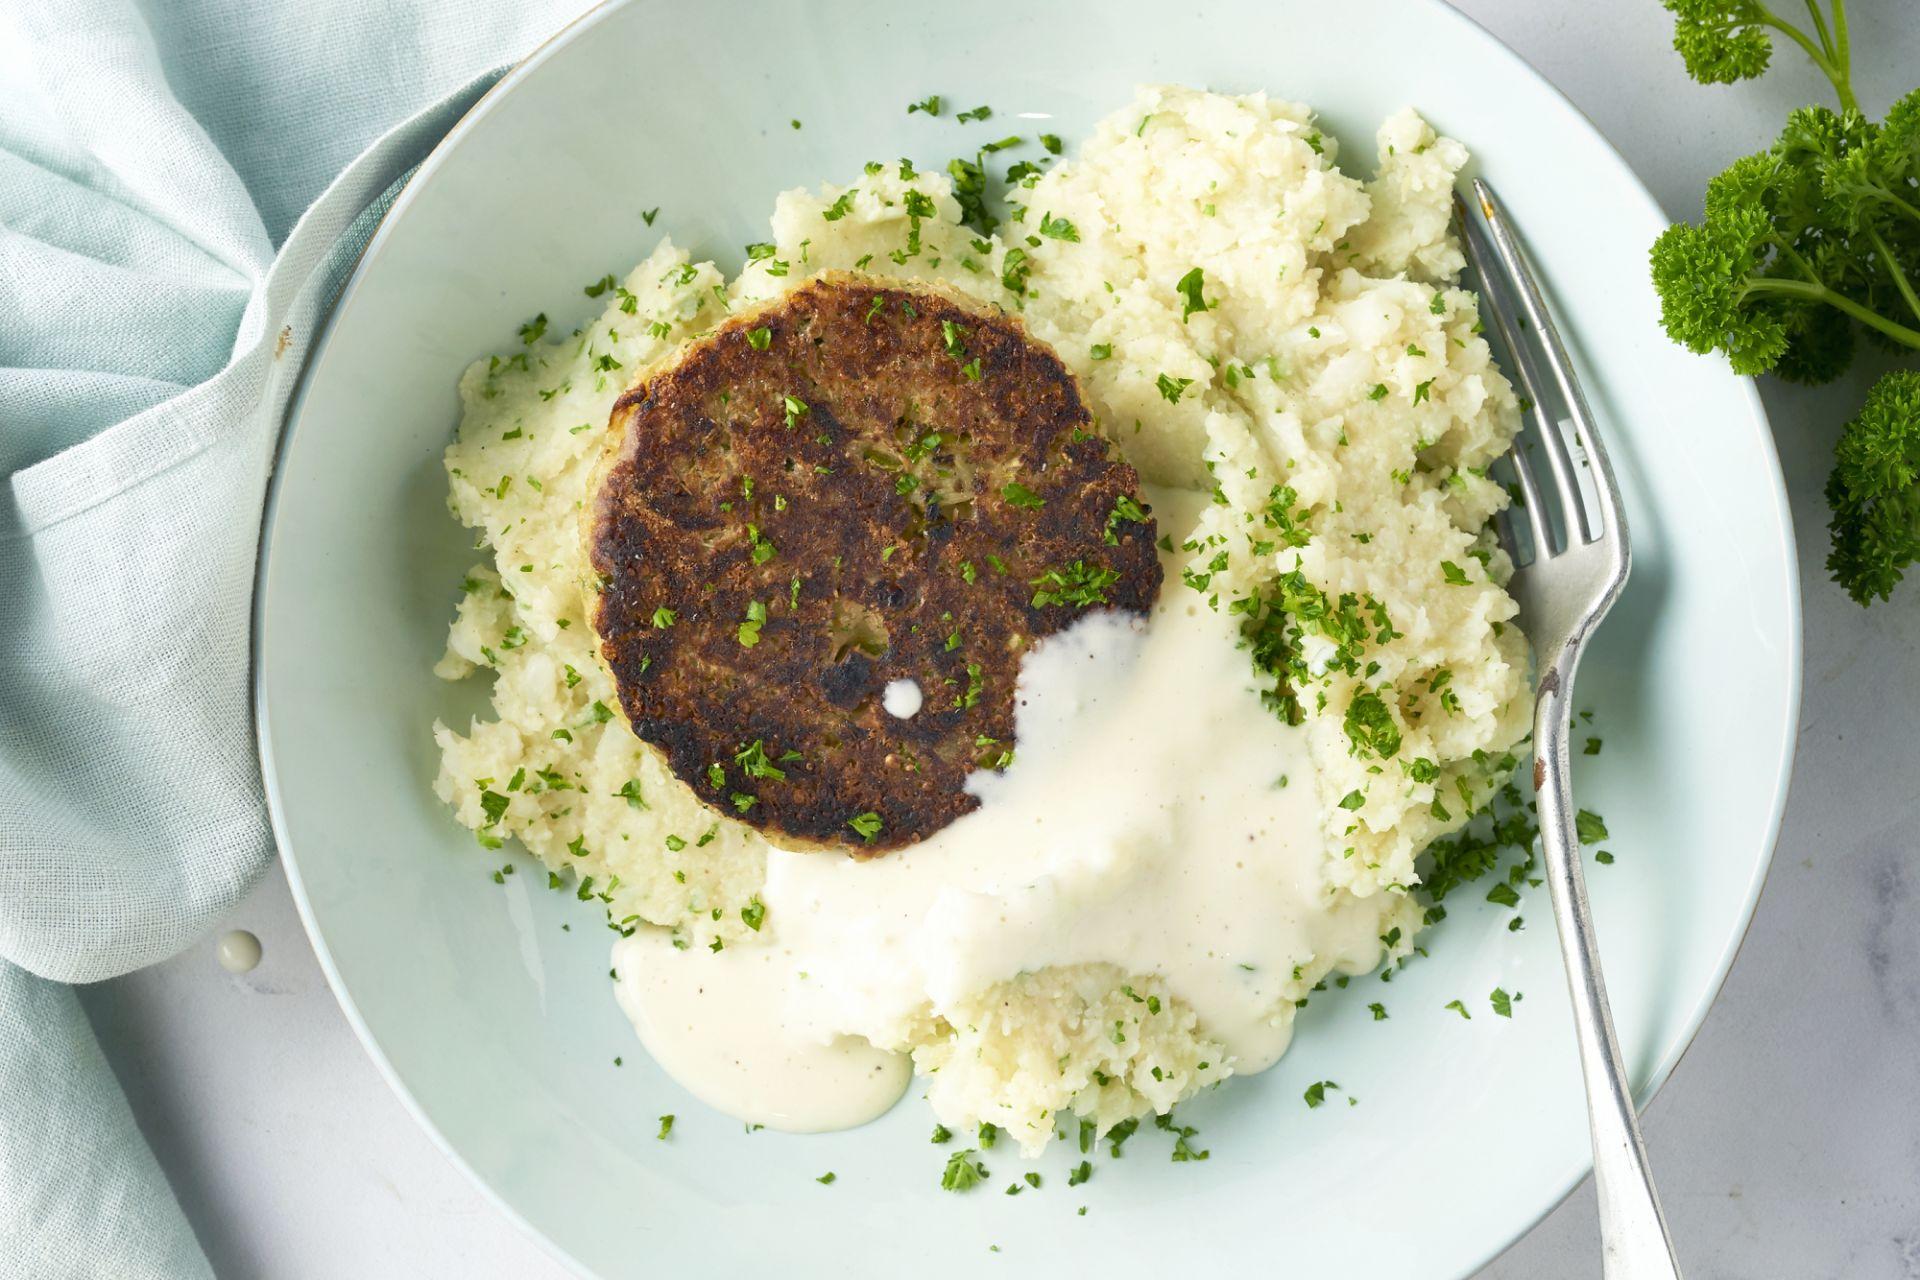 Bloemkoolpuree met vegan groenteburger en kaassaus